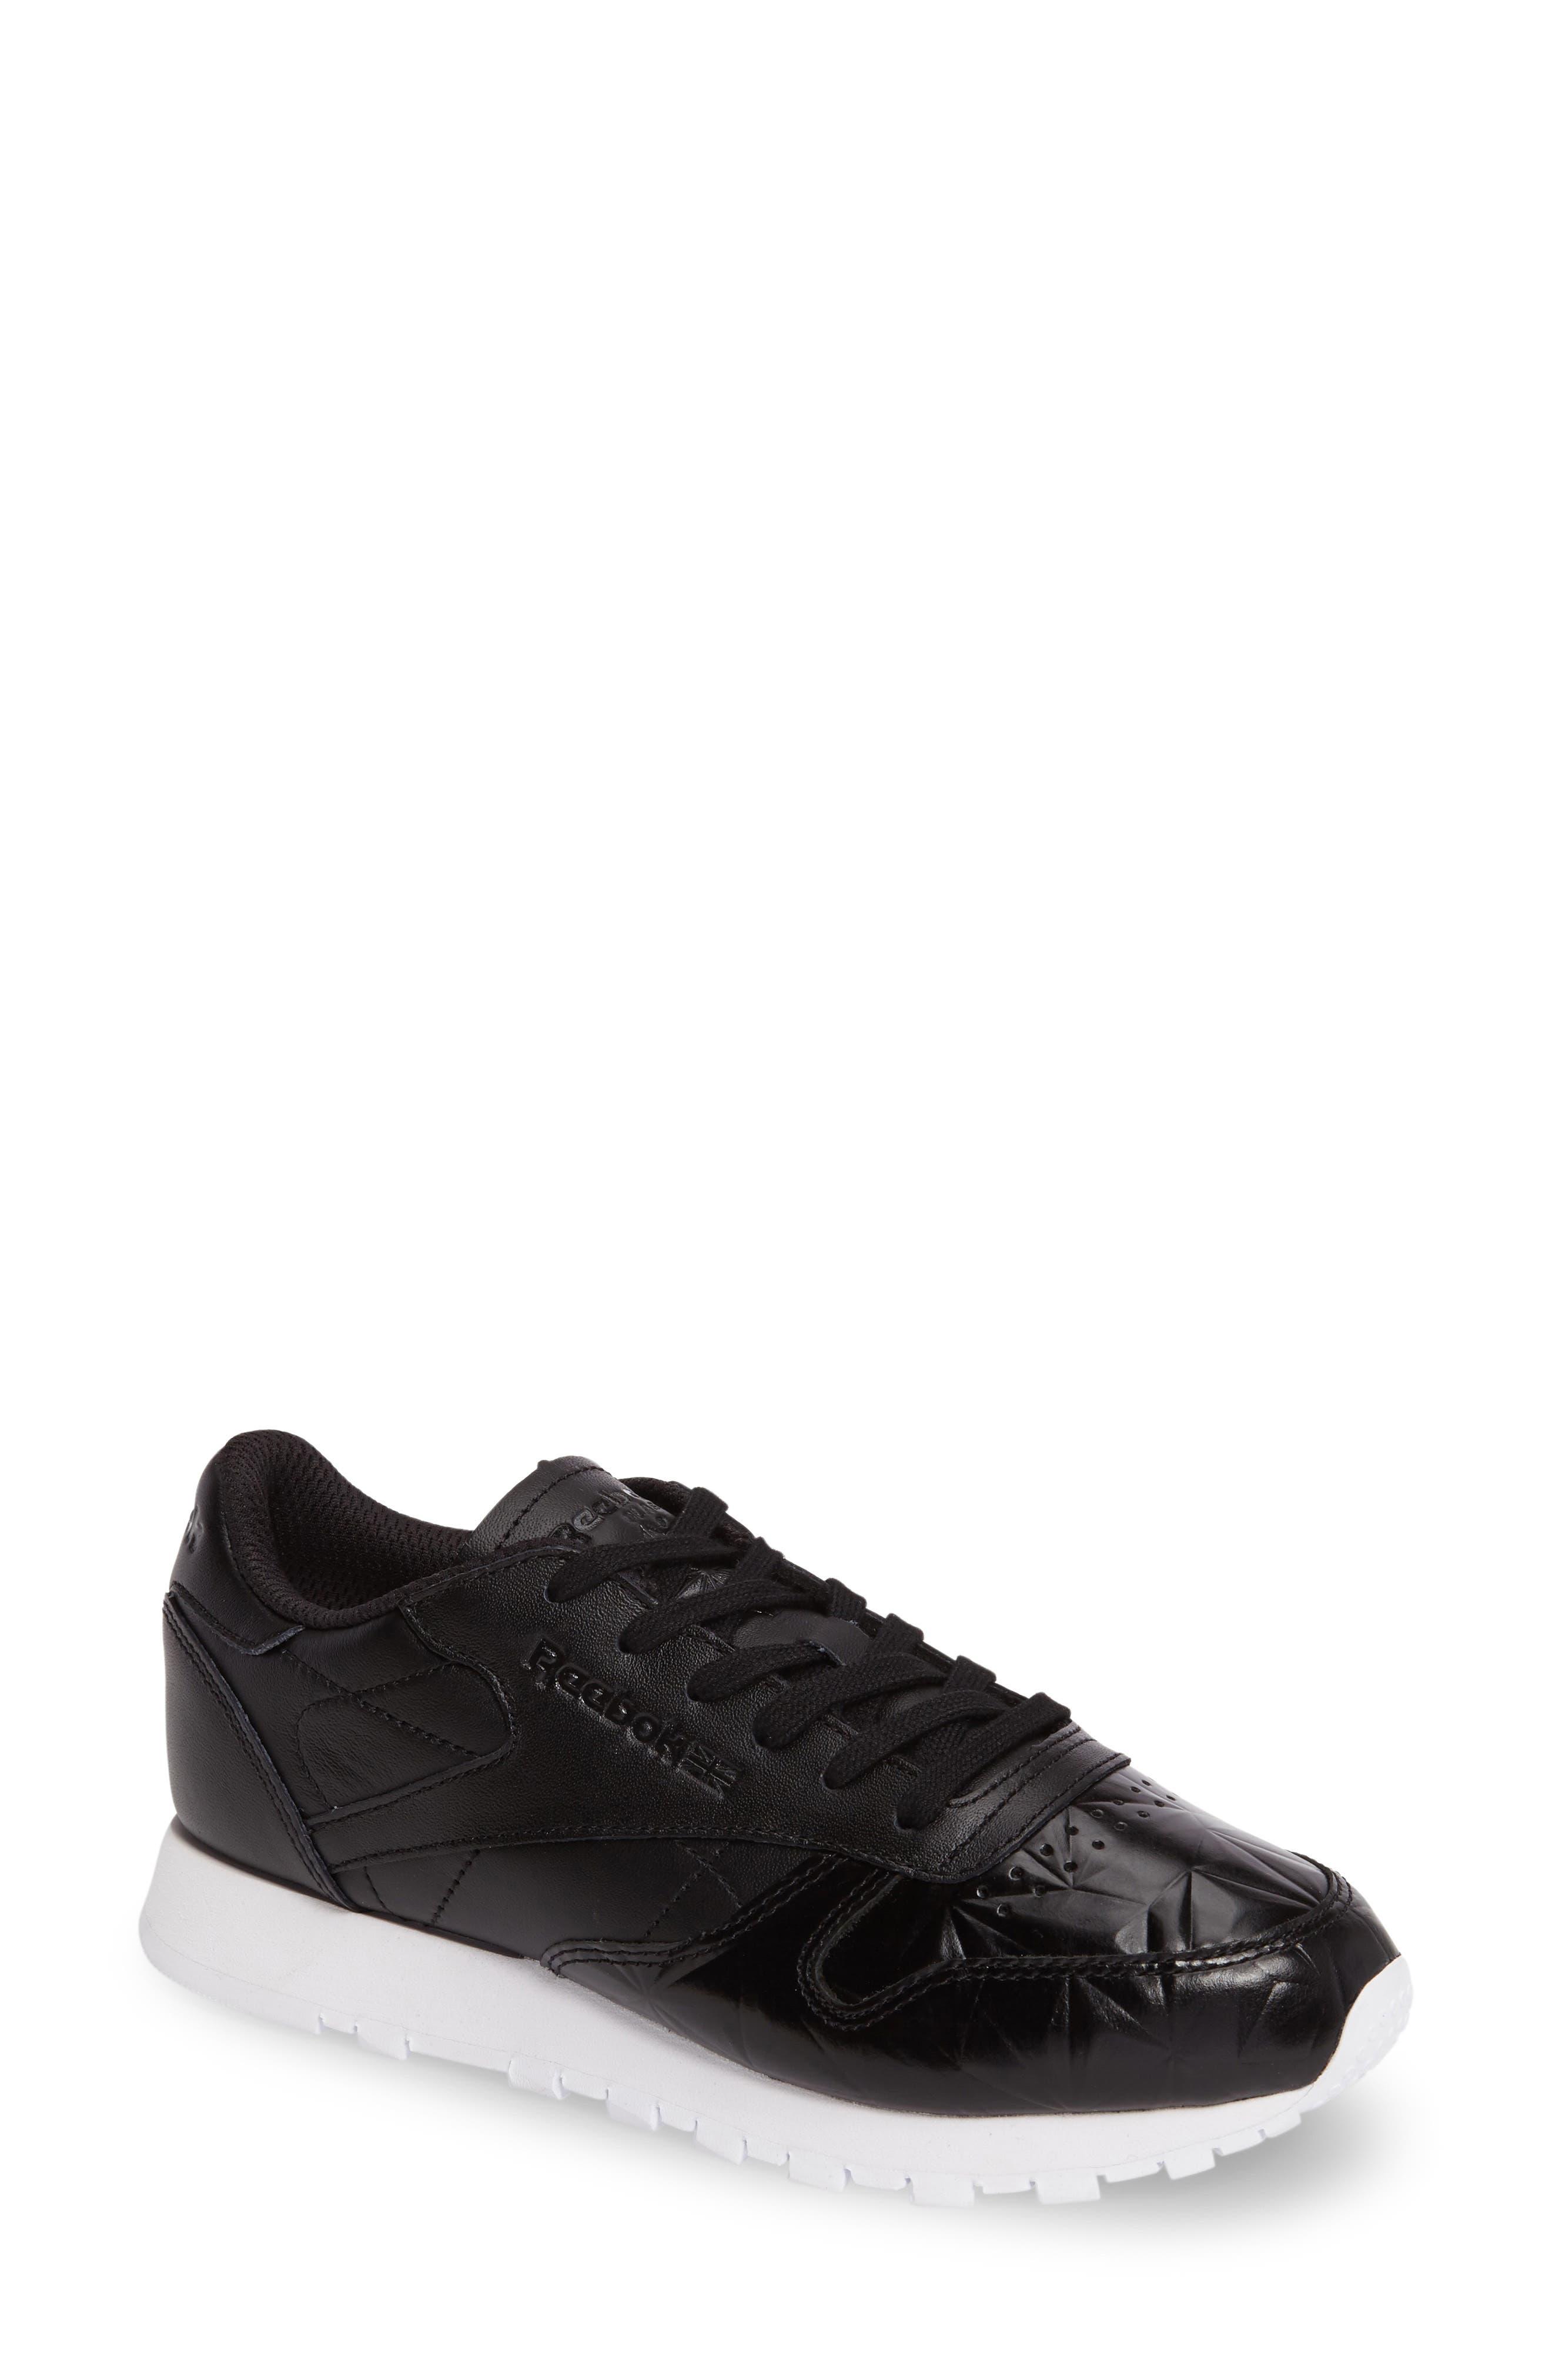 Alternate Image 1 Selected - Reebok Classic Dynamic Chrome Sneaker (Women)